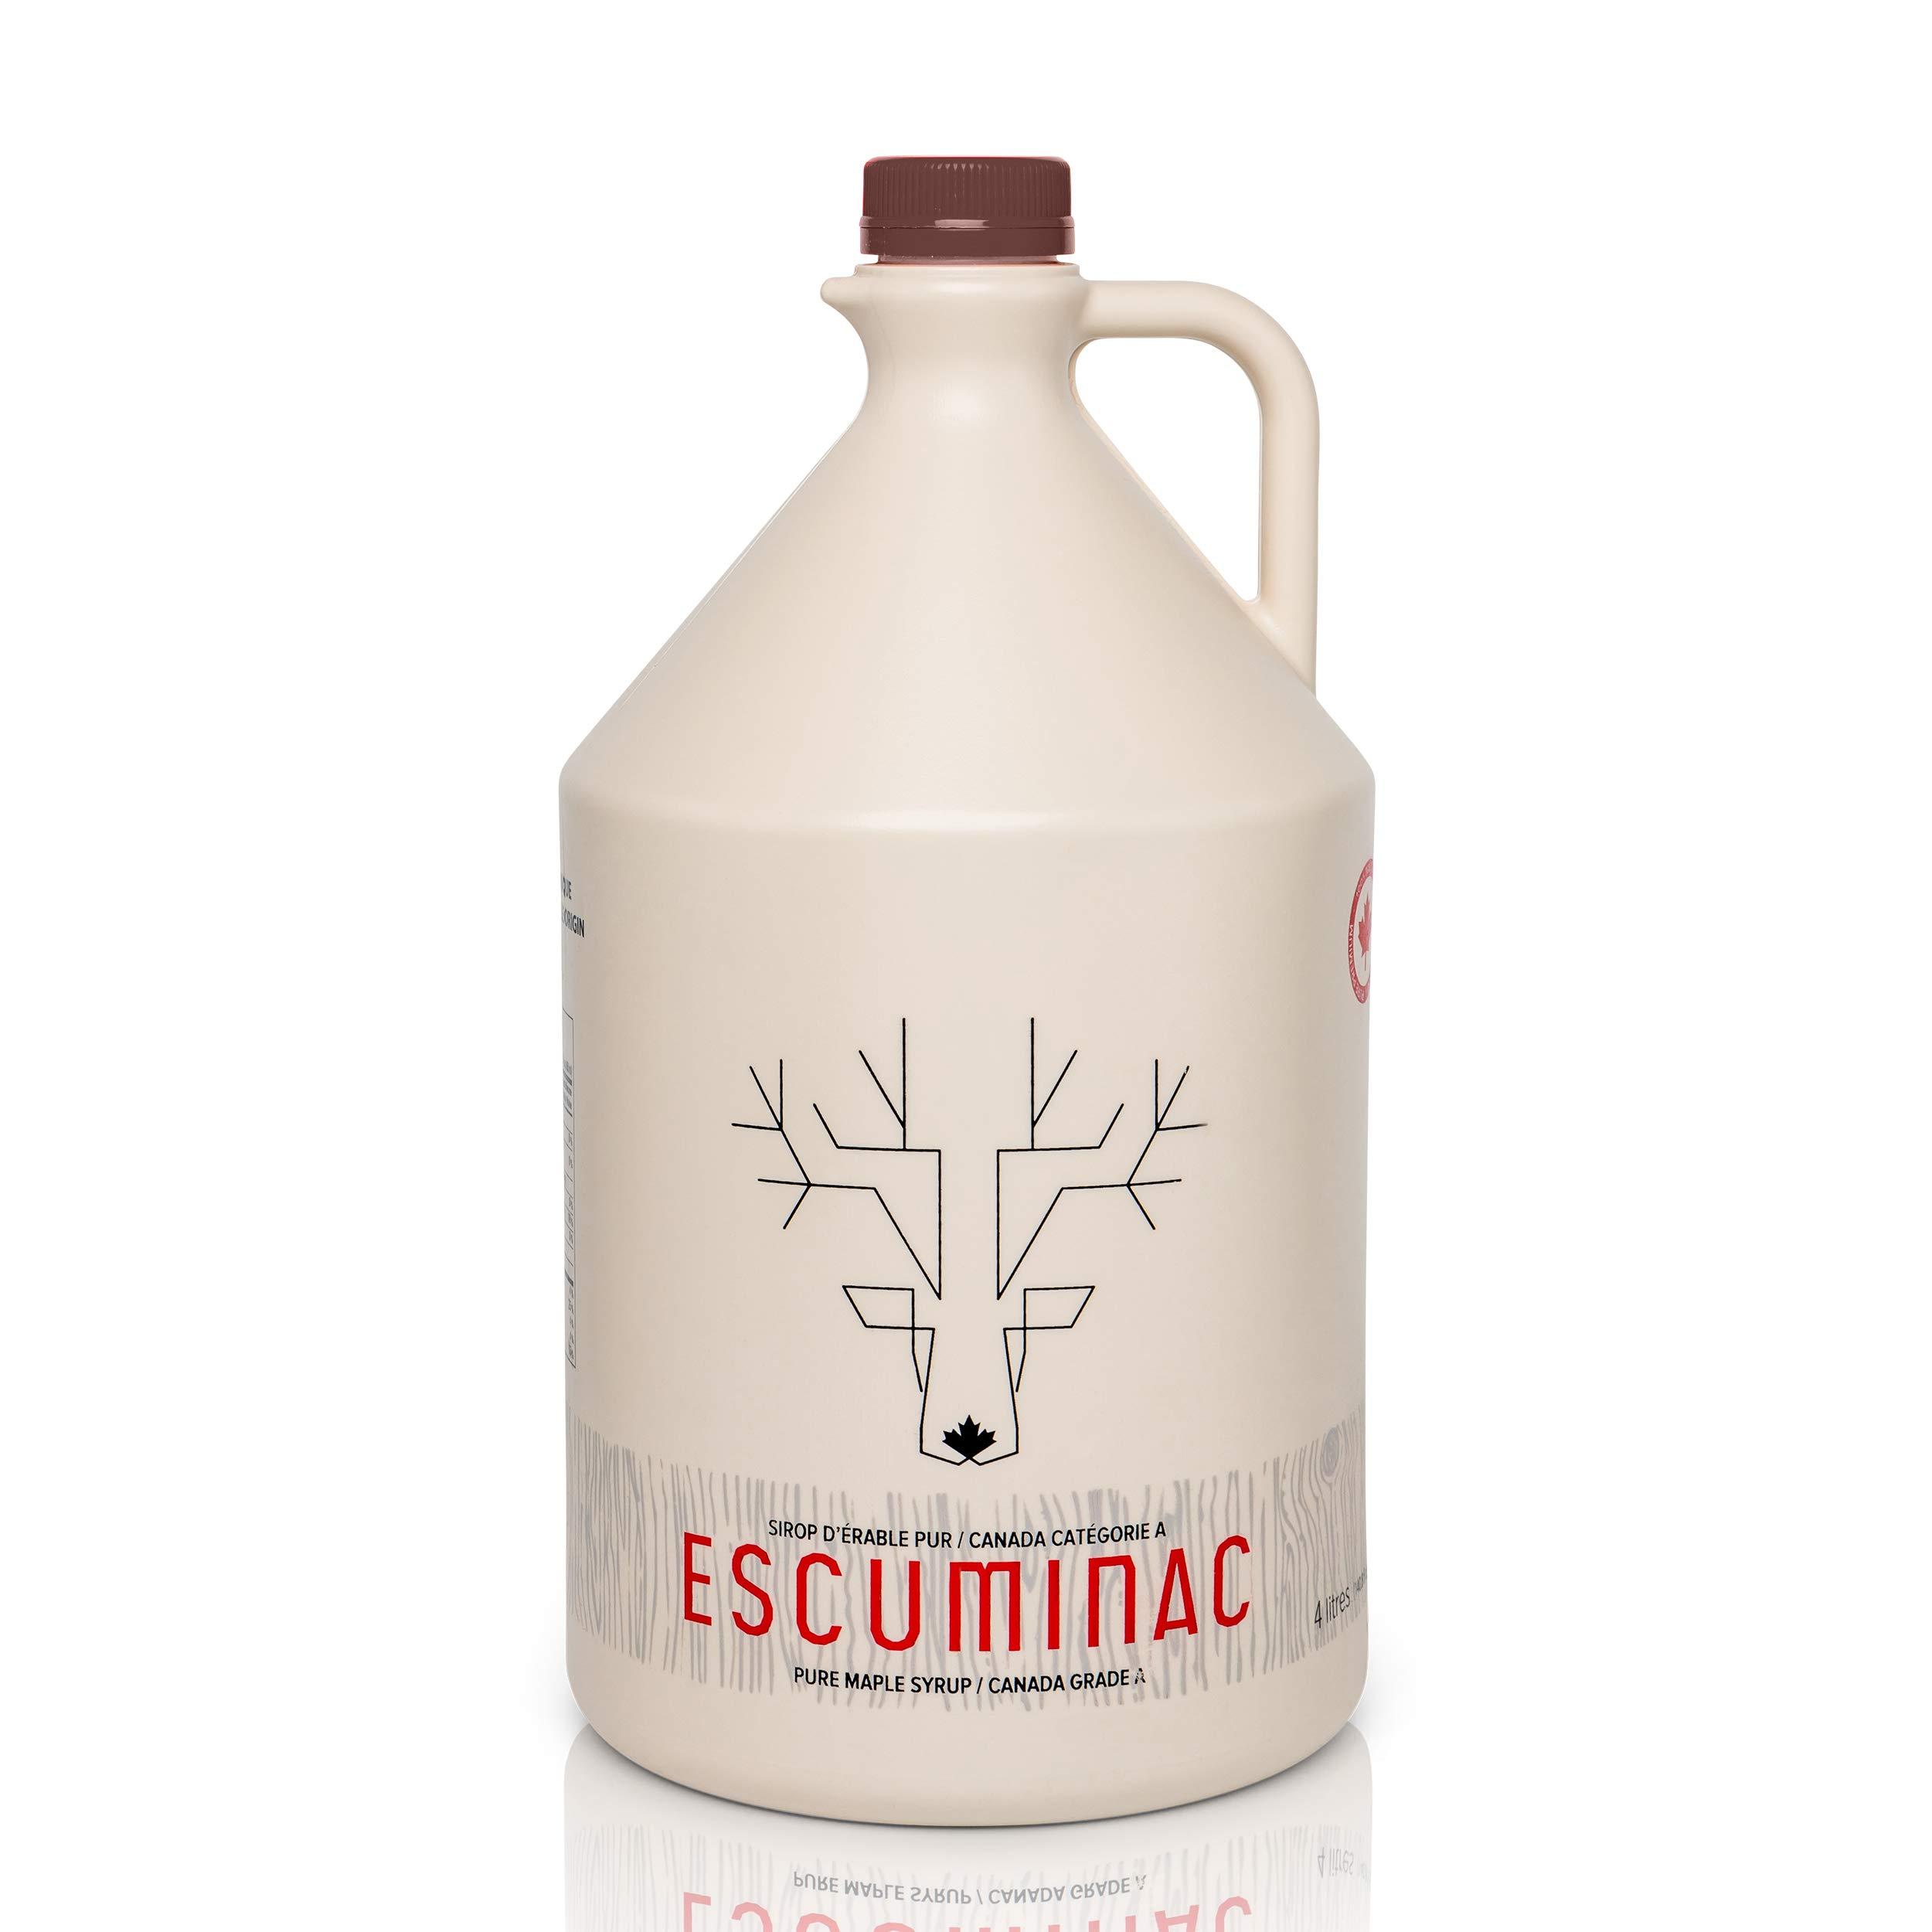 Award Winning Escuminac Late Harvest Canadian Maple Syrup. Restaurant, Chef Size 4L (135 fl oz) Canada Grade A Dark Robust Taste - Pure, Organic, Single Origin, Unblended. by Escuminac